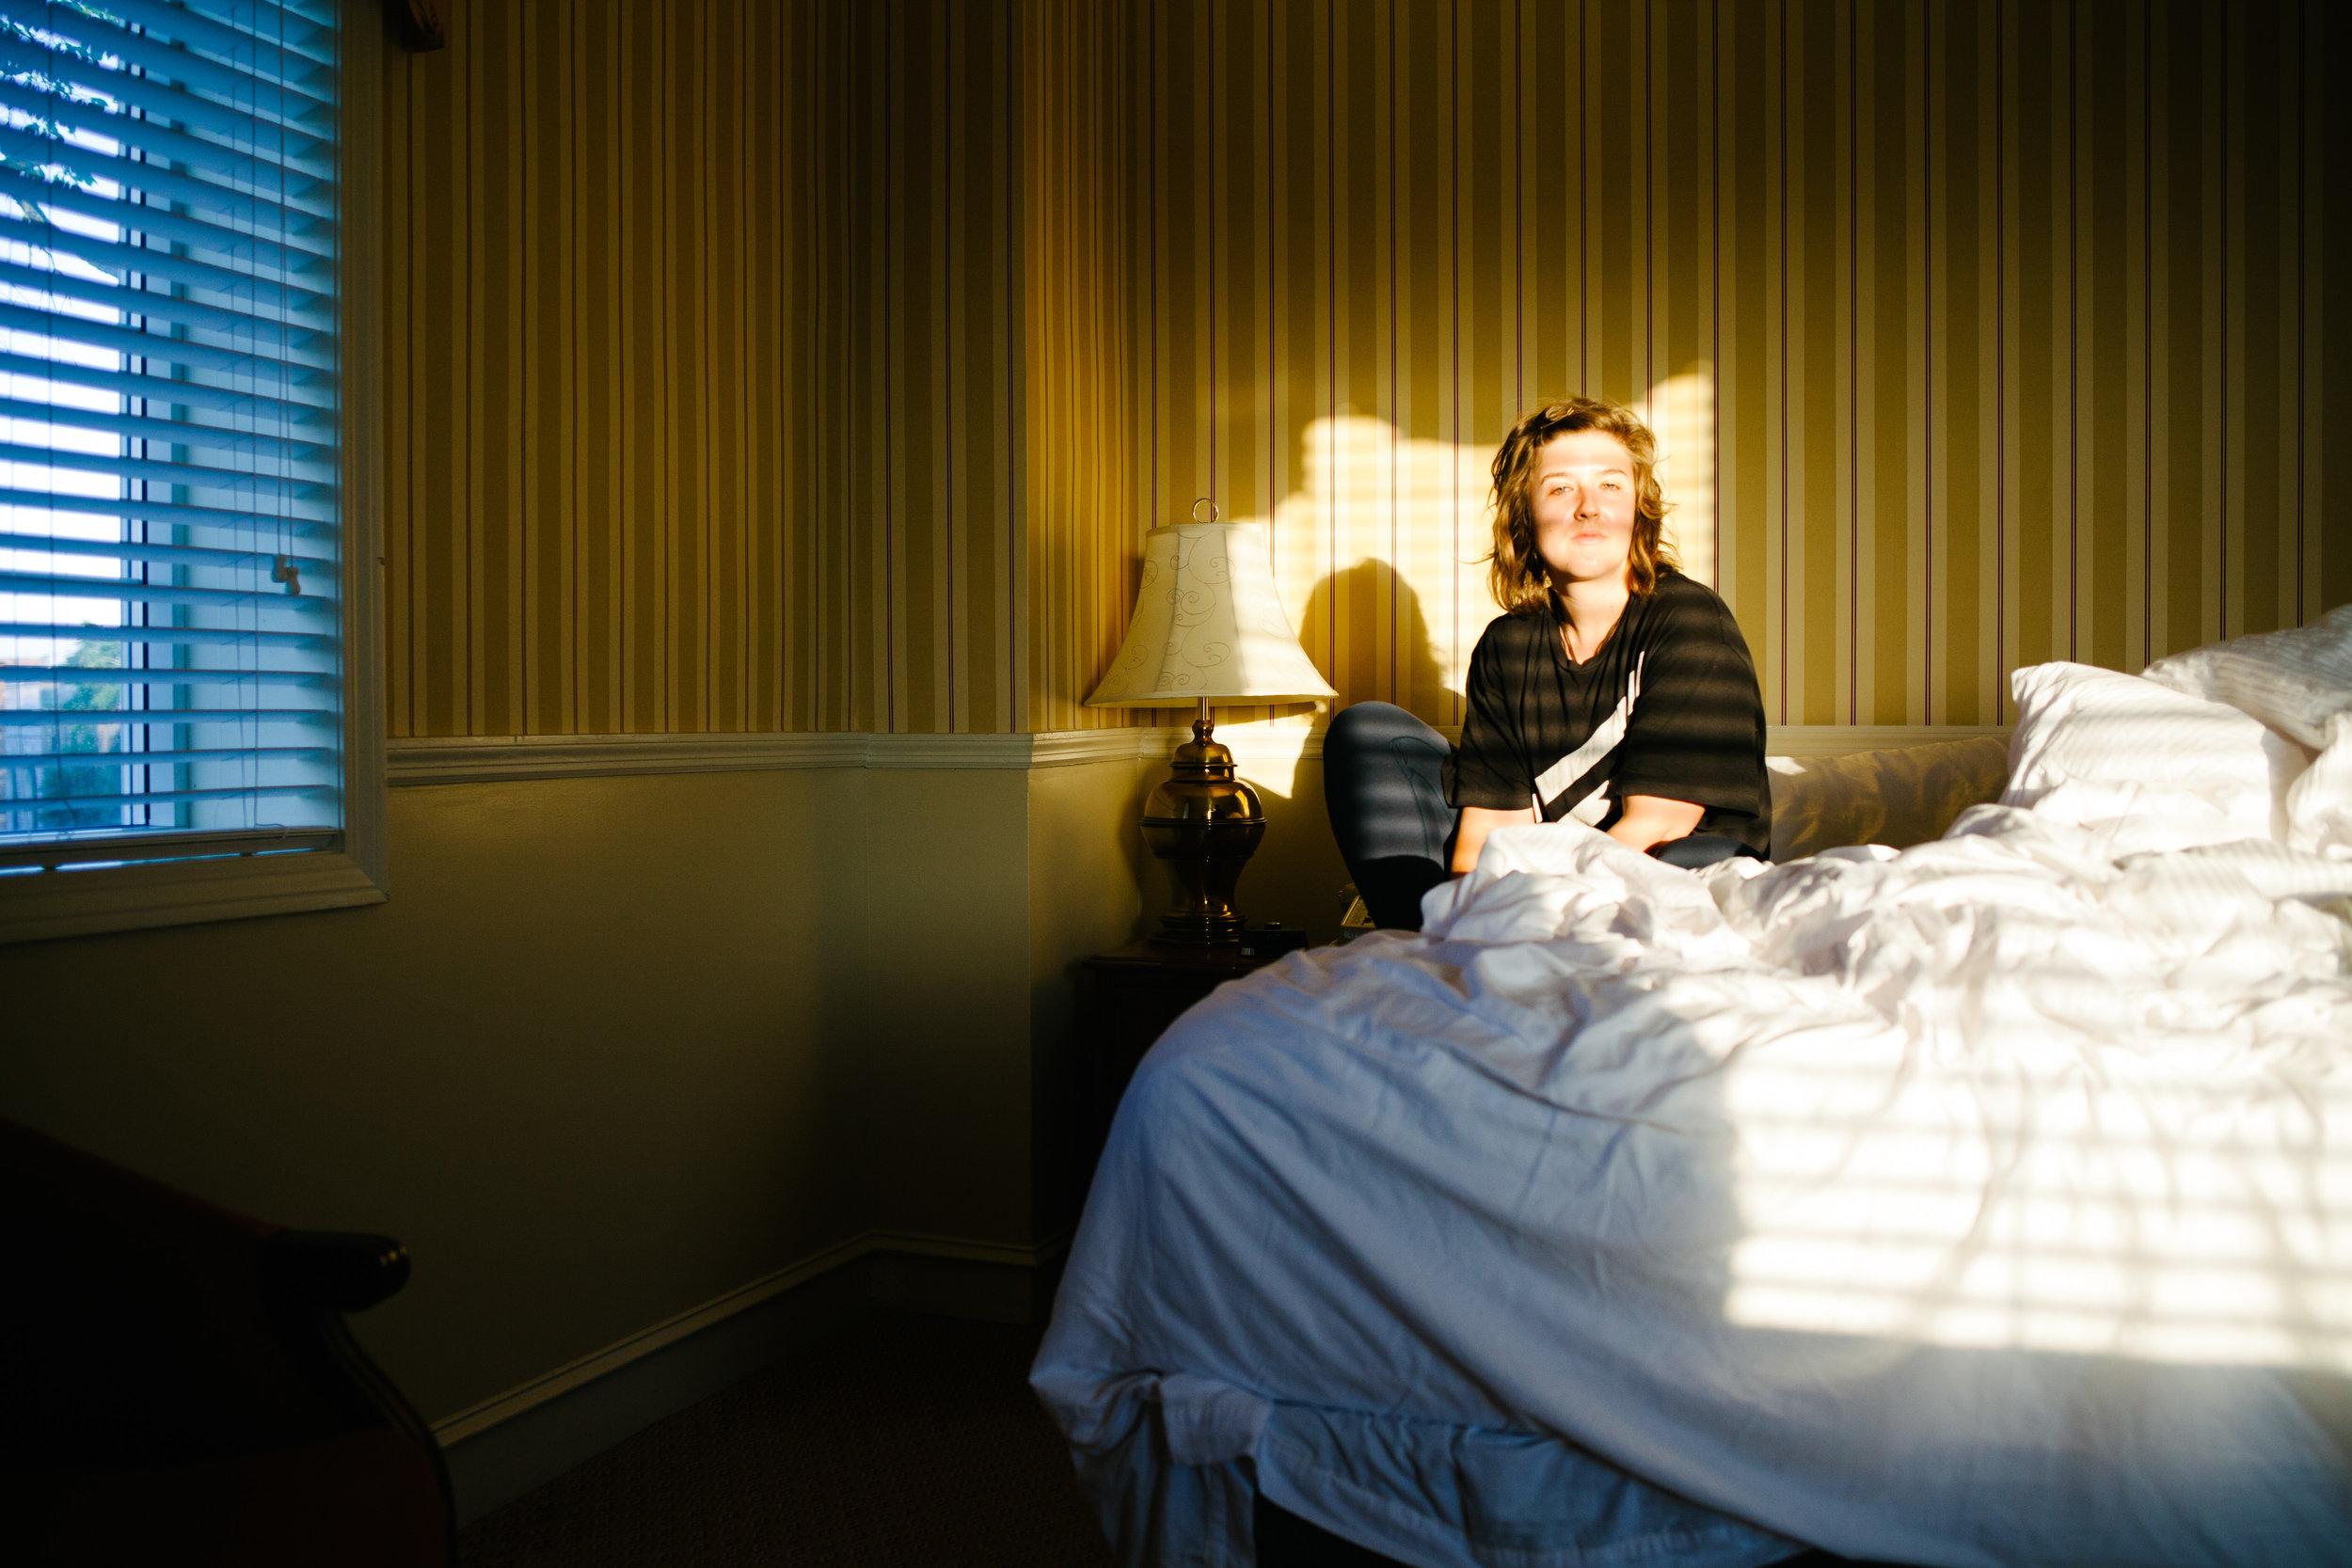 Hotel in Glen Falls NY (defiantly haunted)